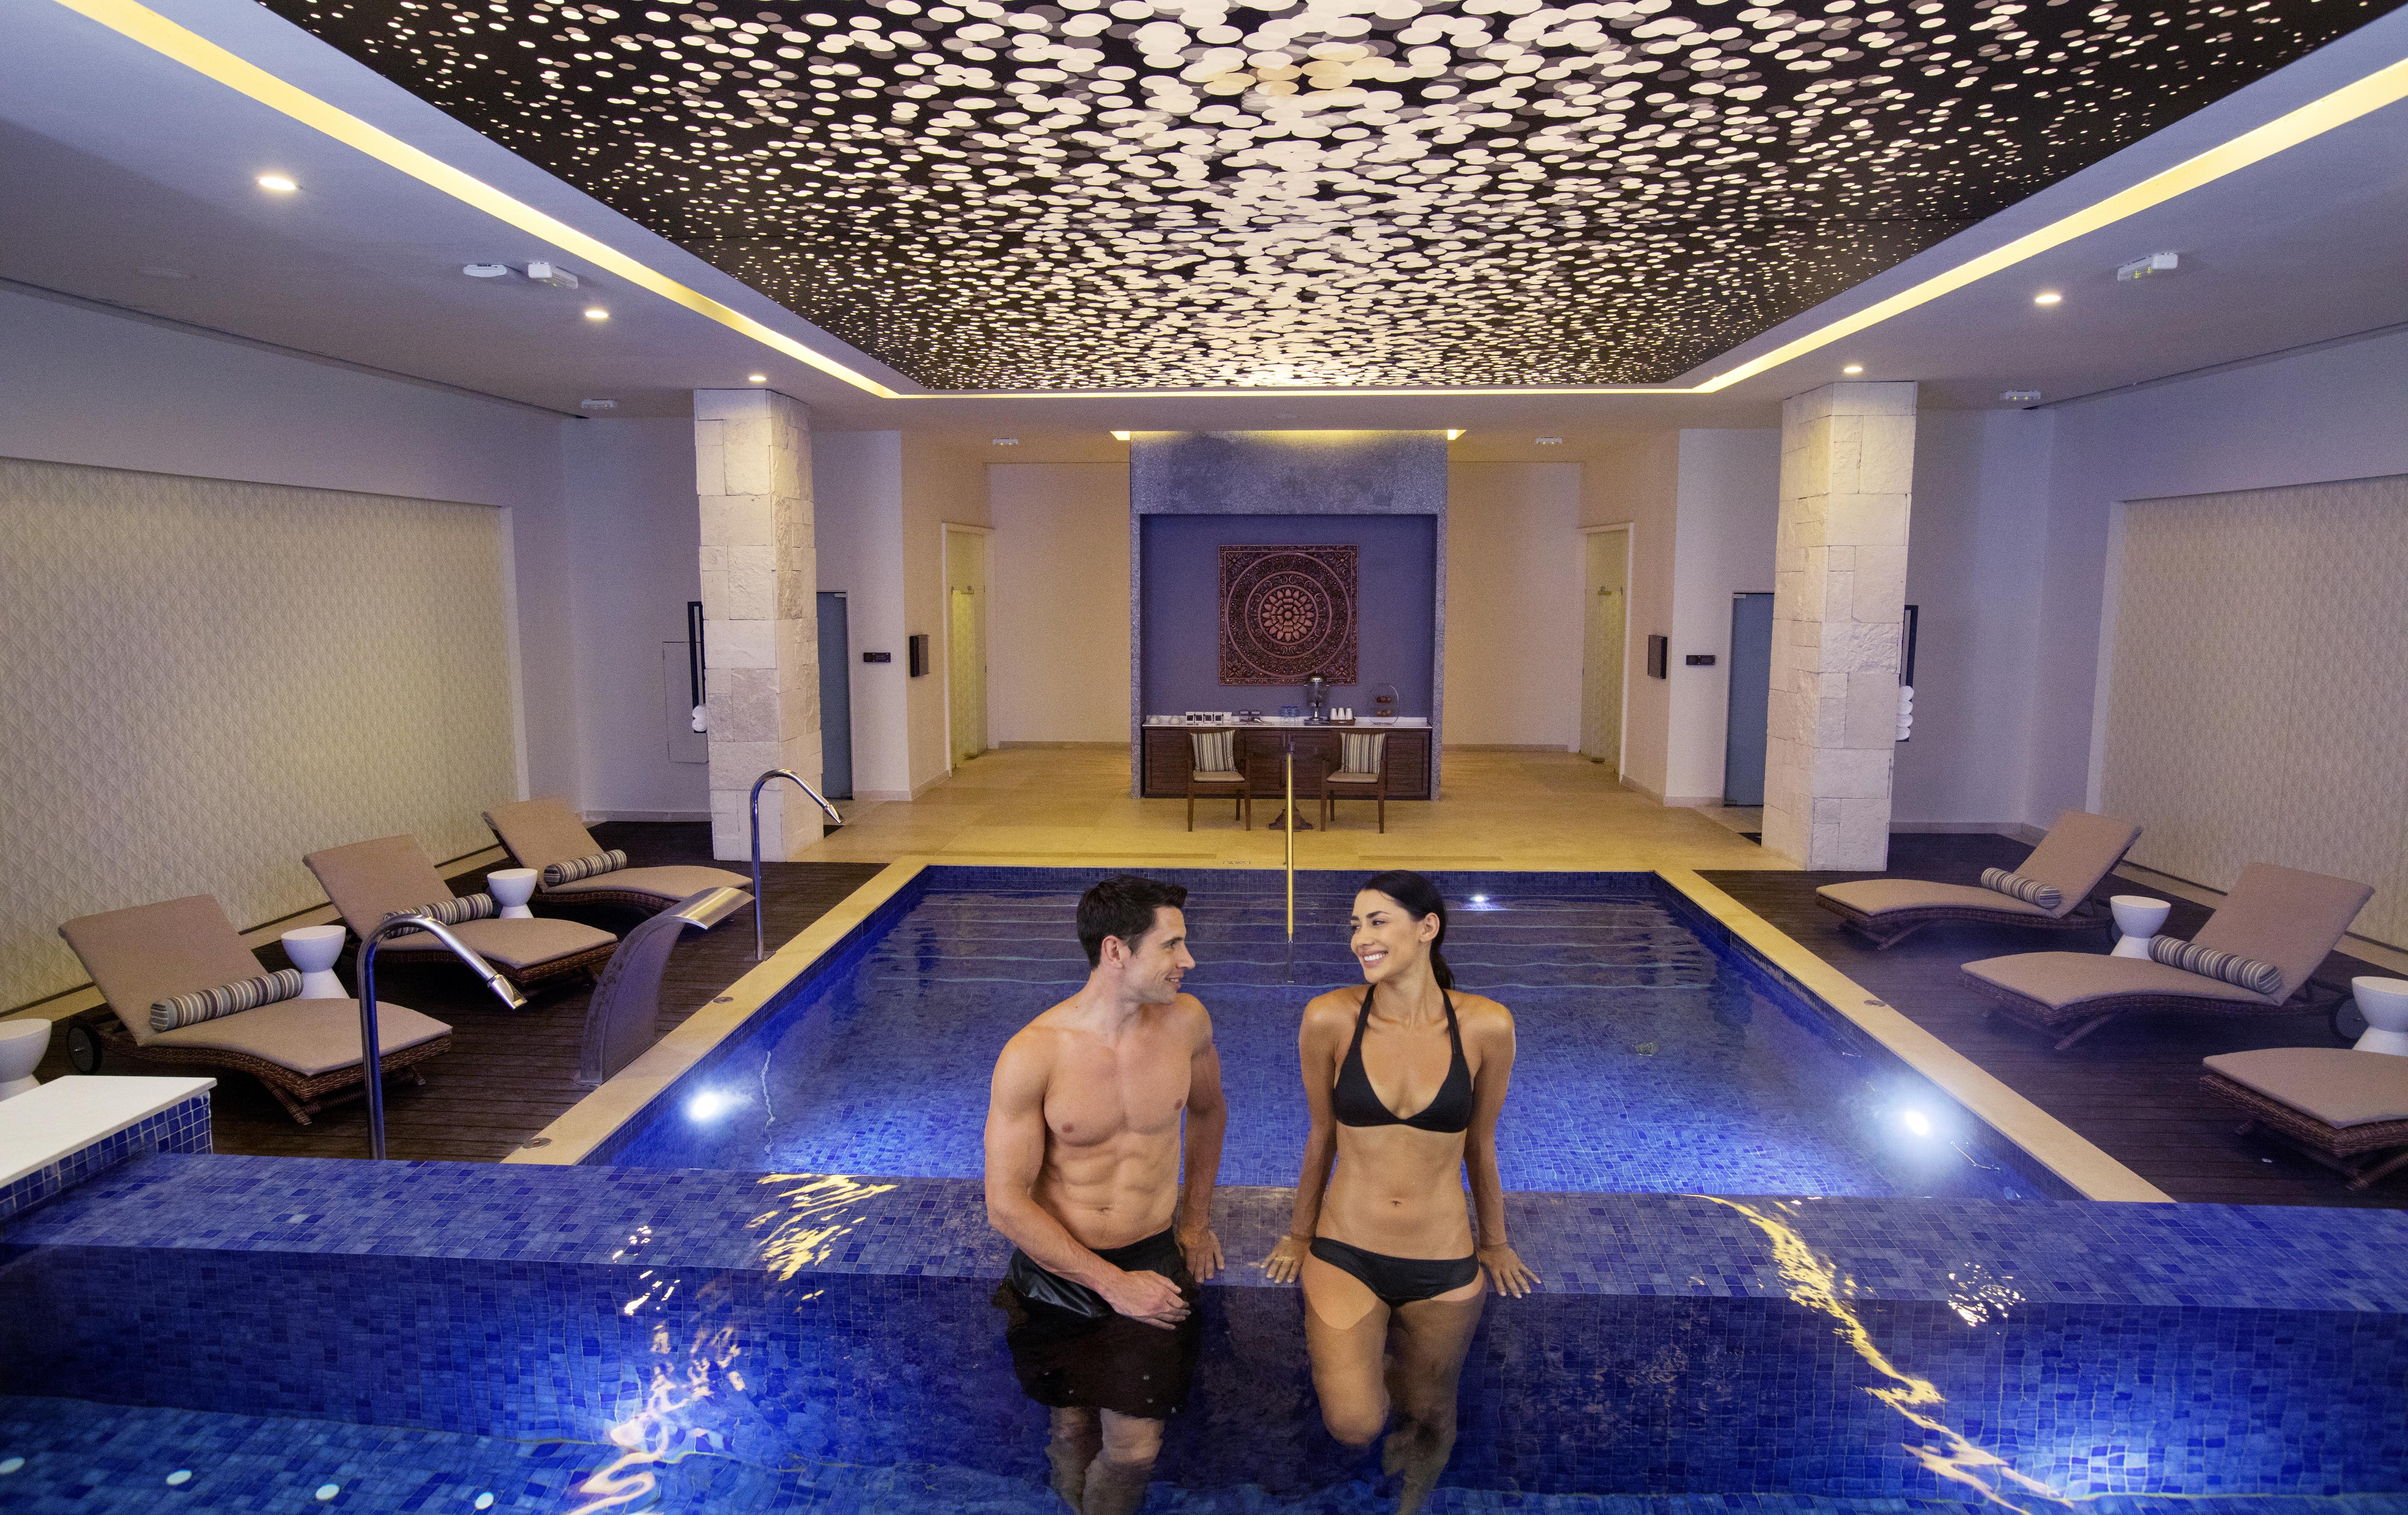 Travel Agency All-Inclusive Resort Hidea